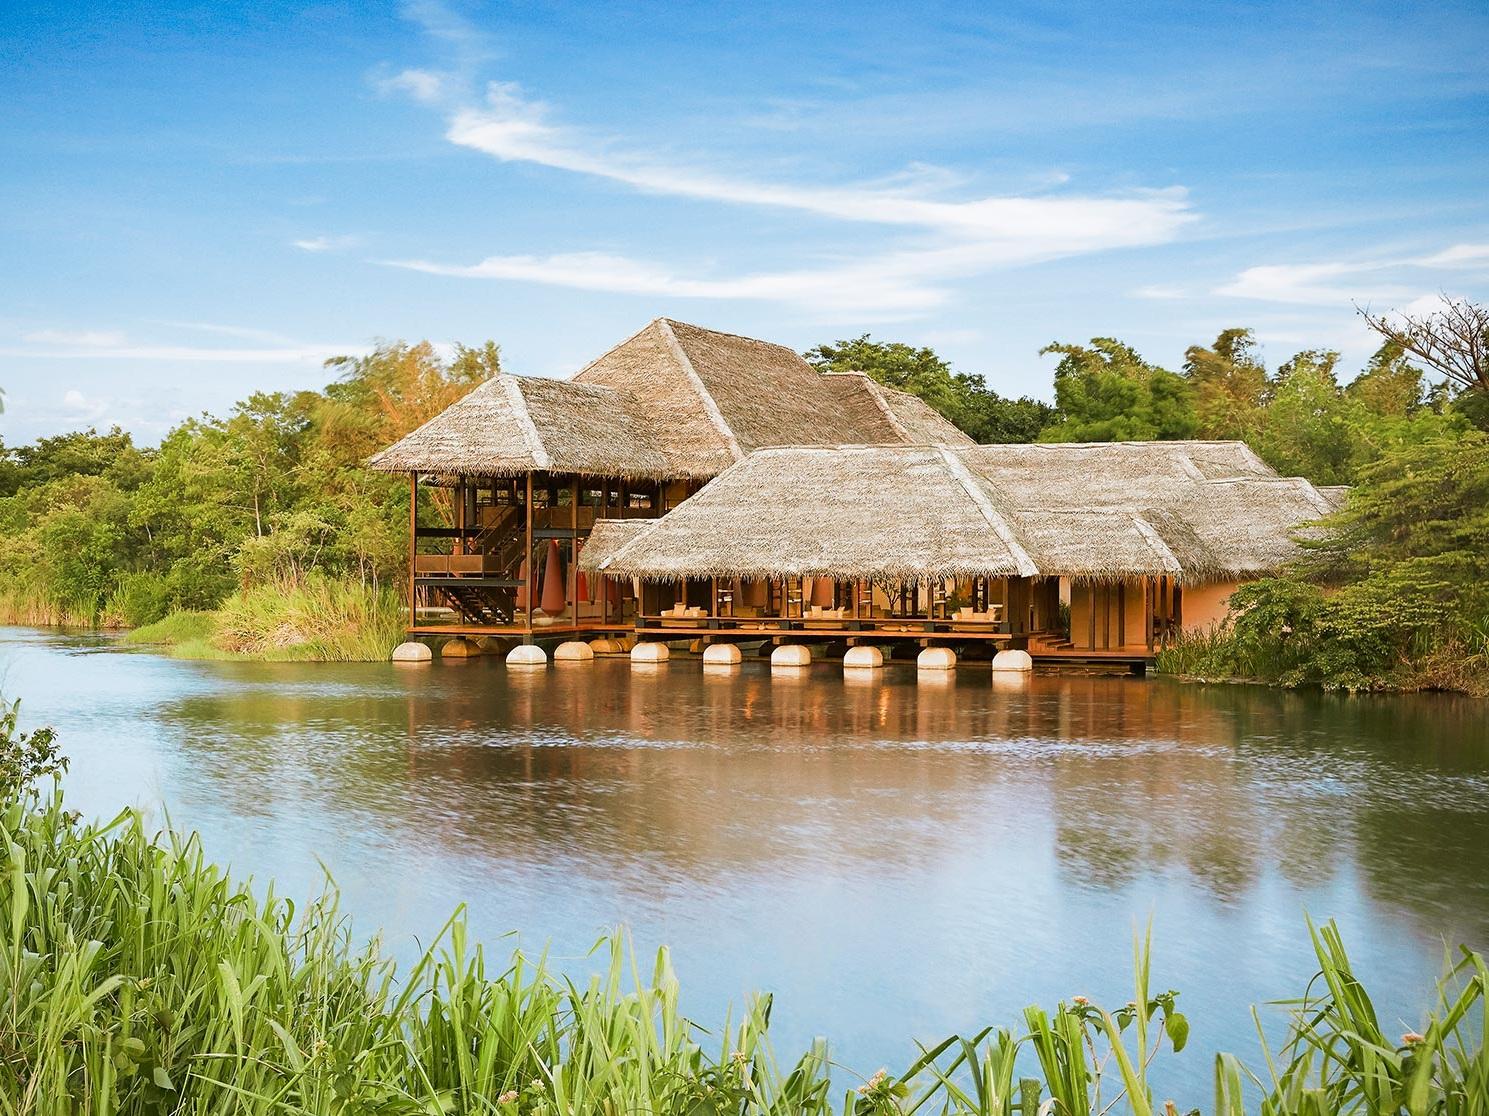 Vil Uyana, perfect for bird watching and wildlife safaris in Sri Lanka